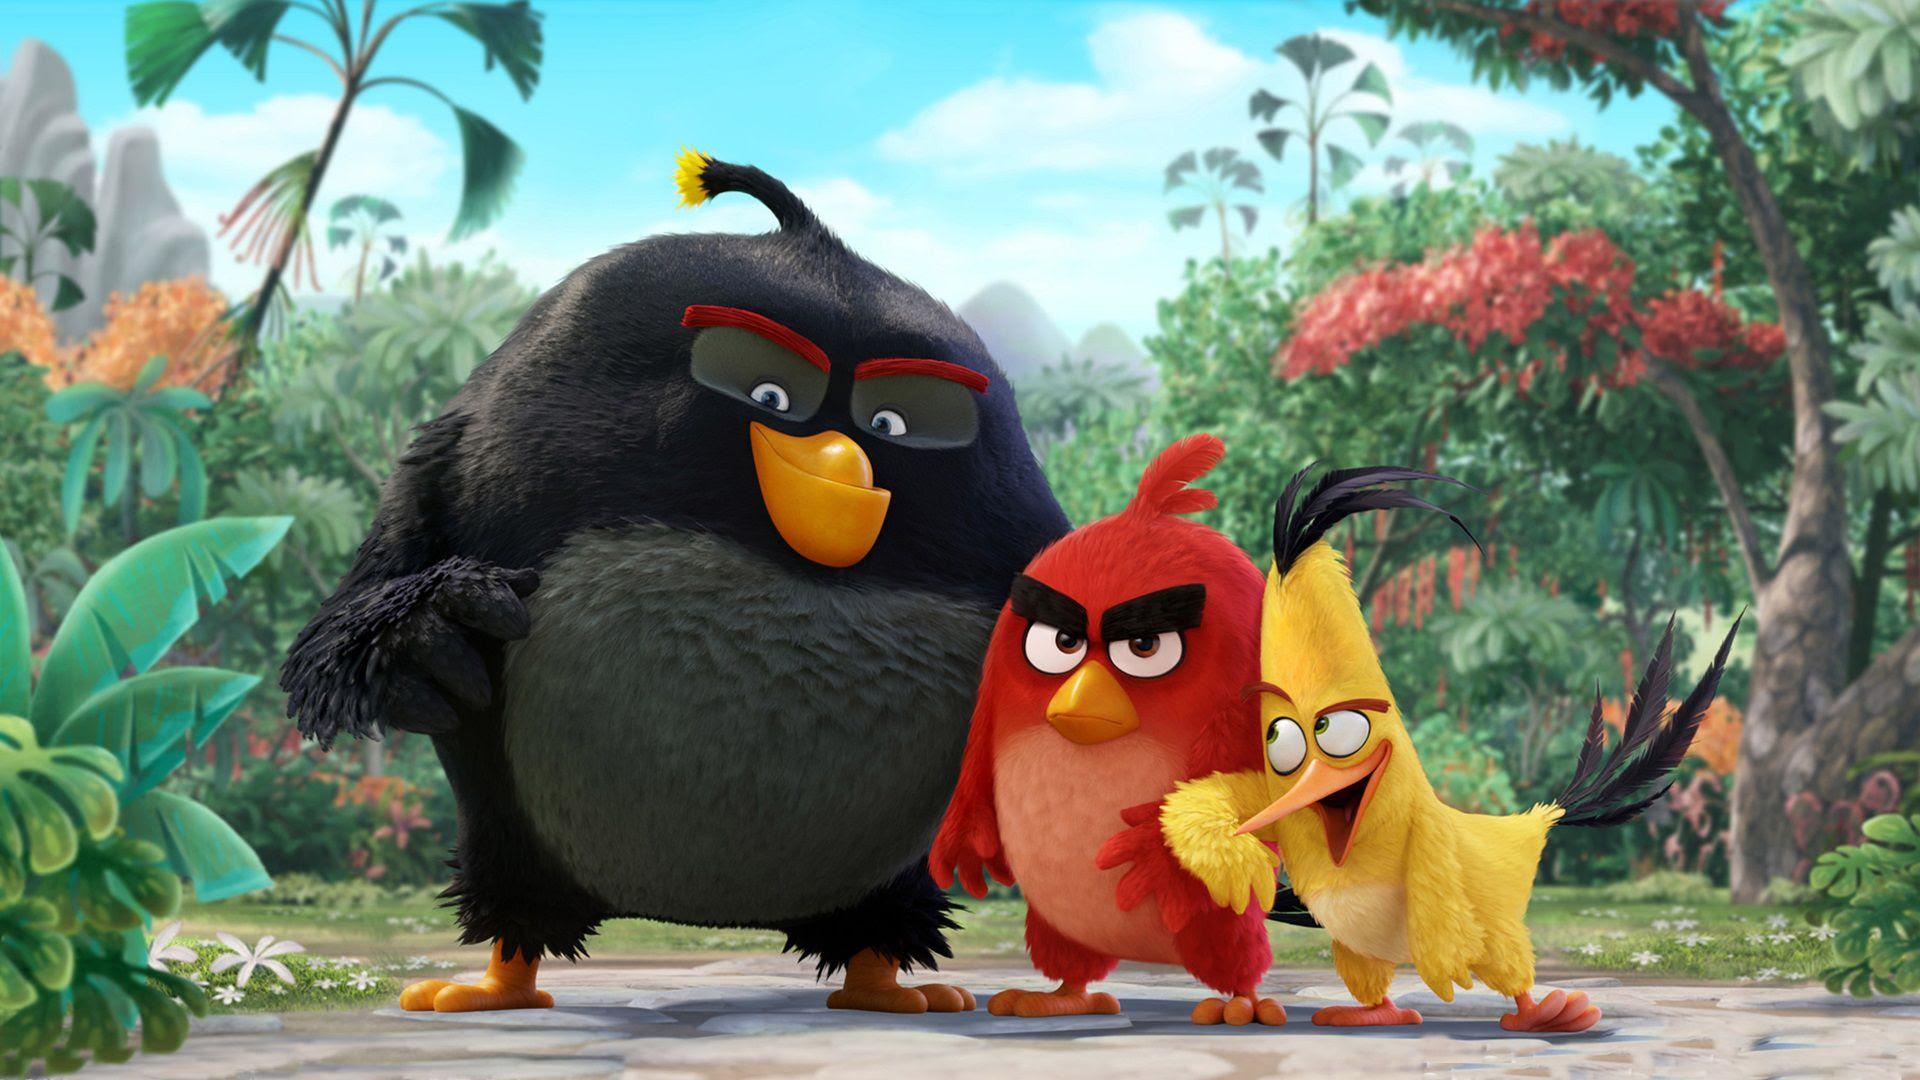 The Angry Birds Movie Photos